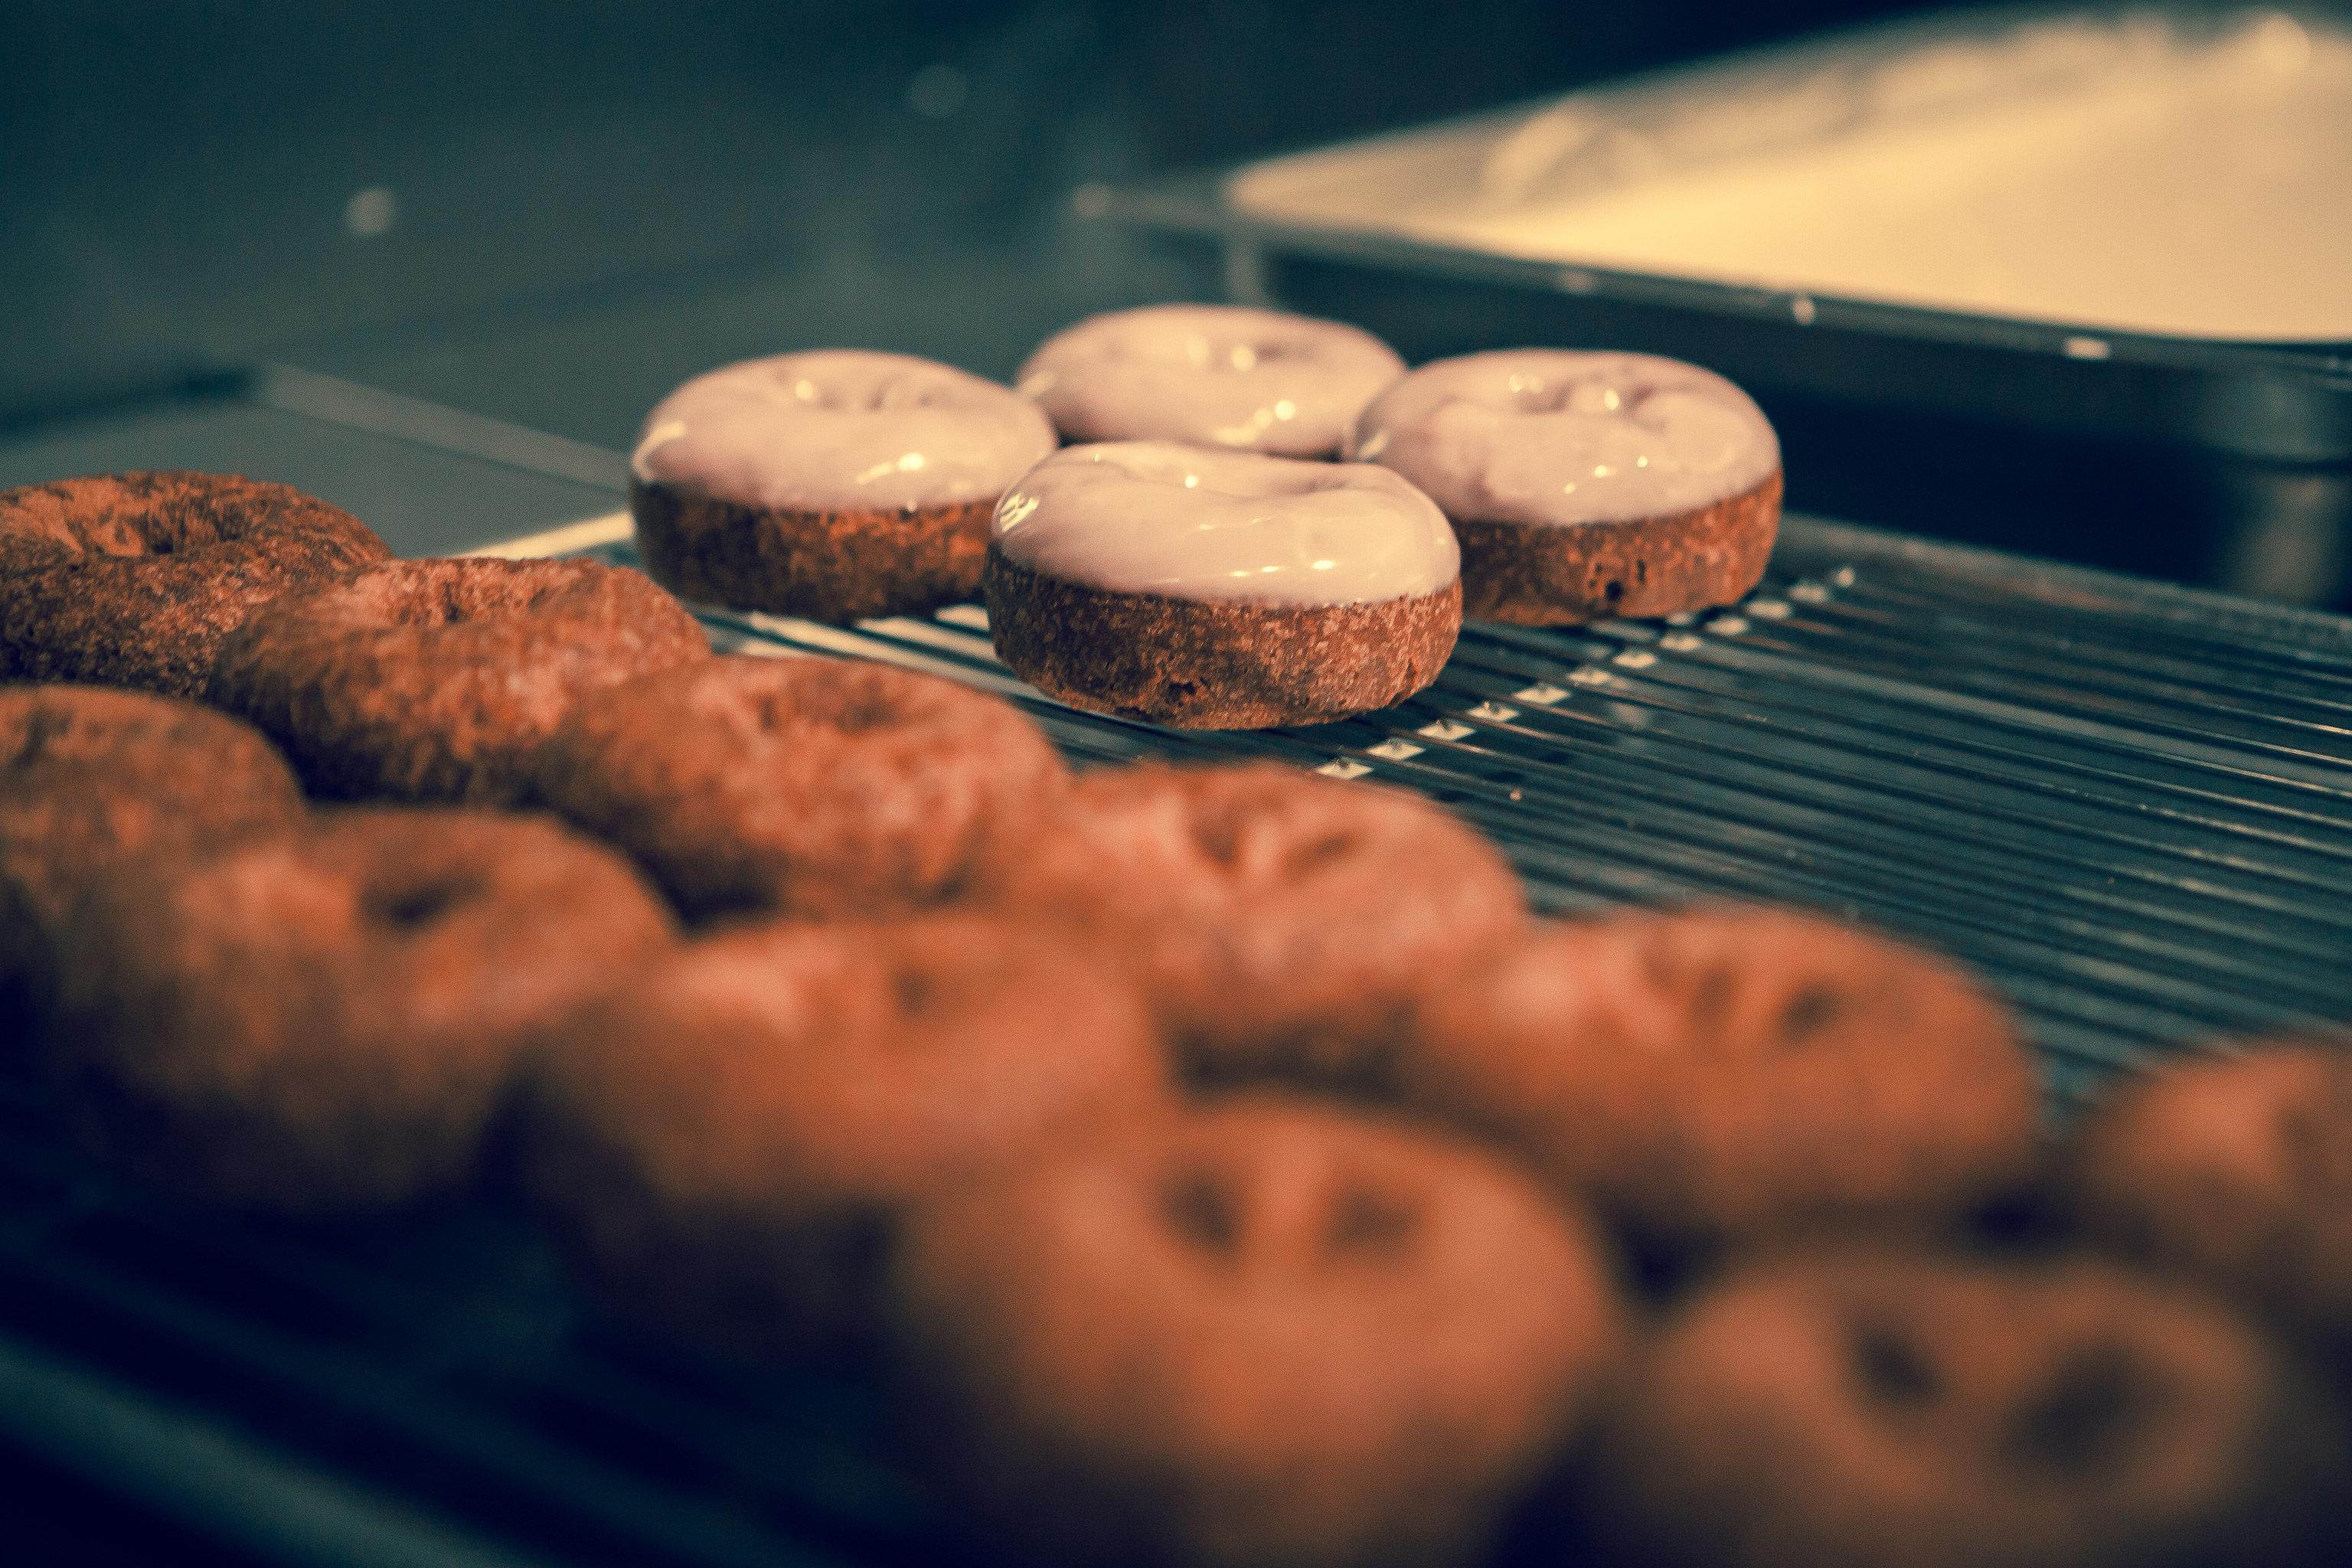 Food + Drink Style + Design Trip Ideas Weekend Getaways doughnut donut indoor baking sweetness close up cookies and crackers chocolate baked goods flavor finger food food snack dessert cookie close vegetable